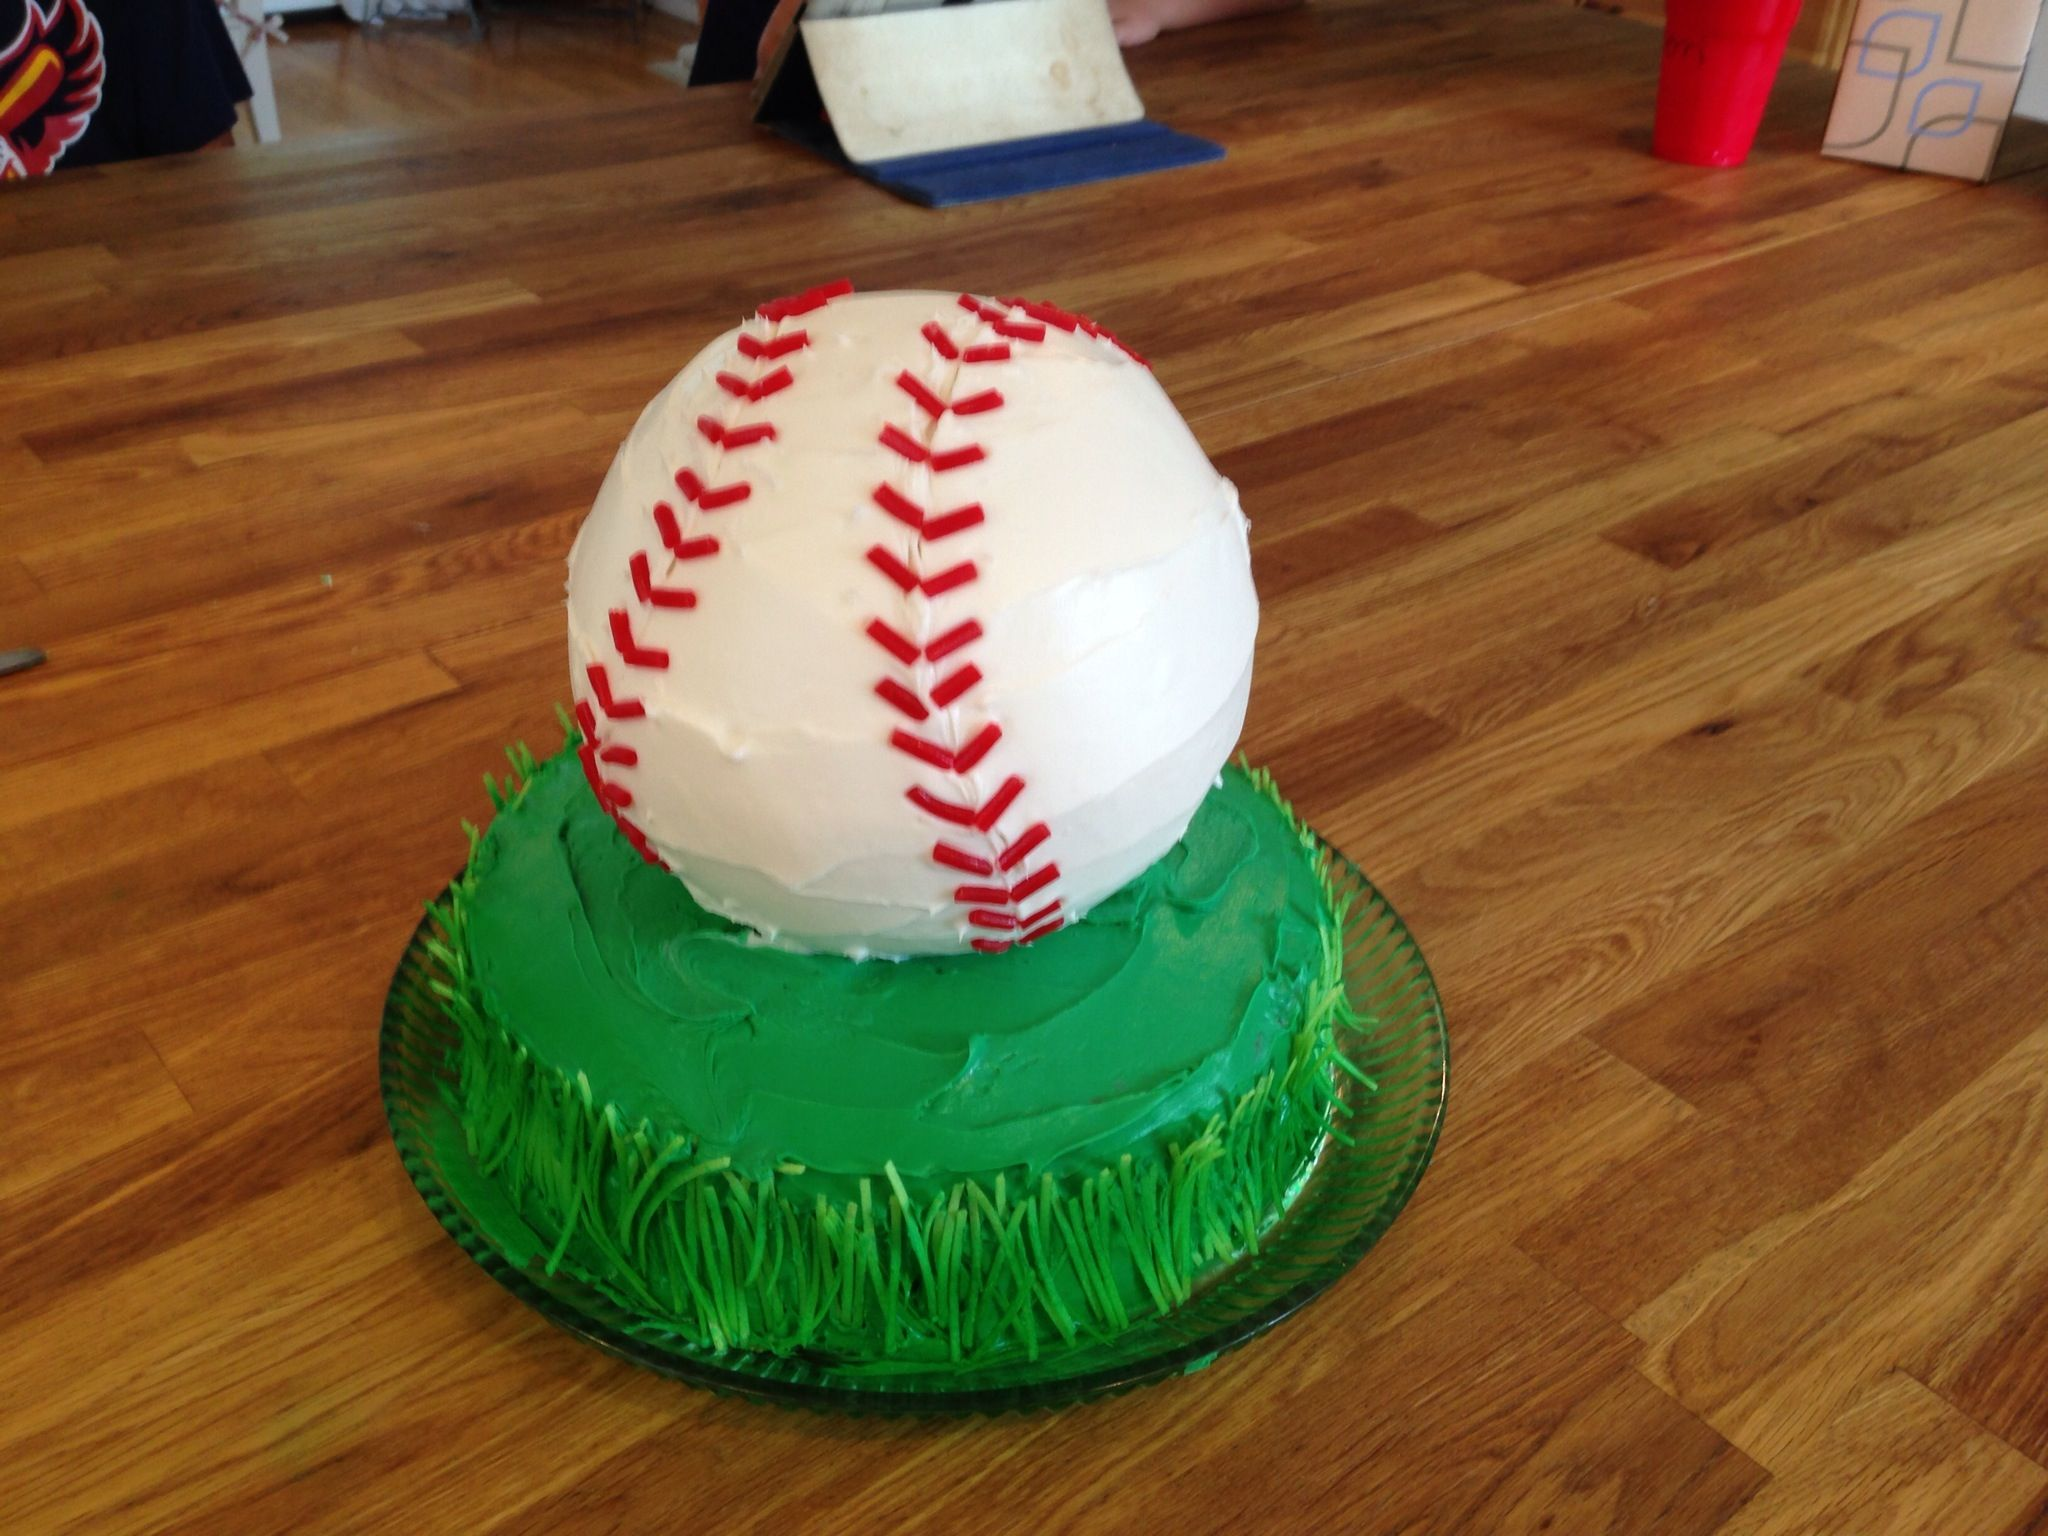 Evans 10th birthday cupcake cakes 10th birthday birthday